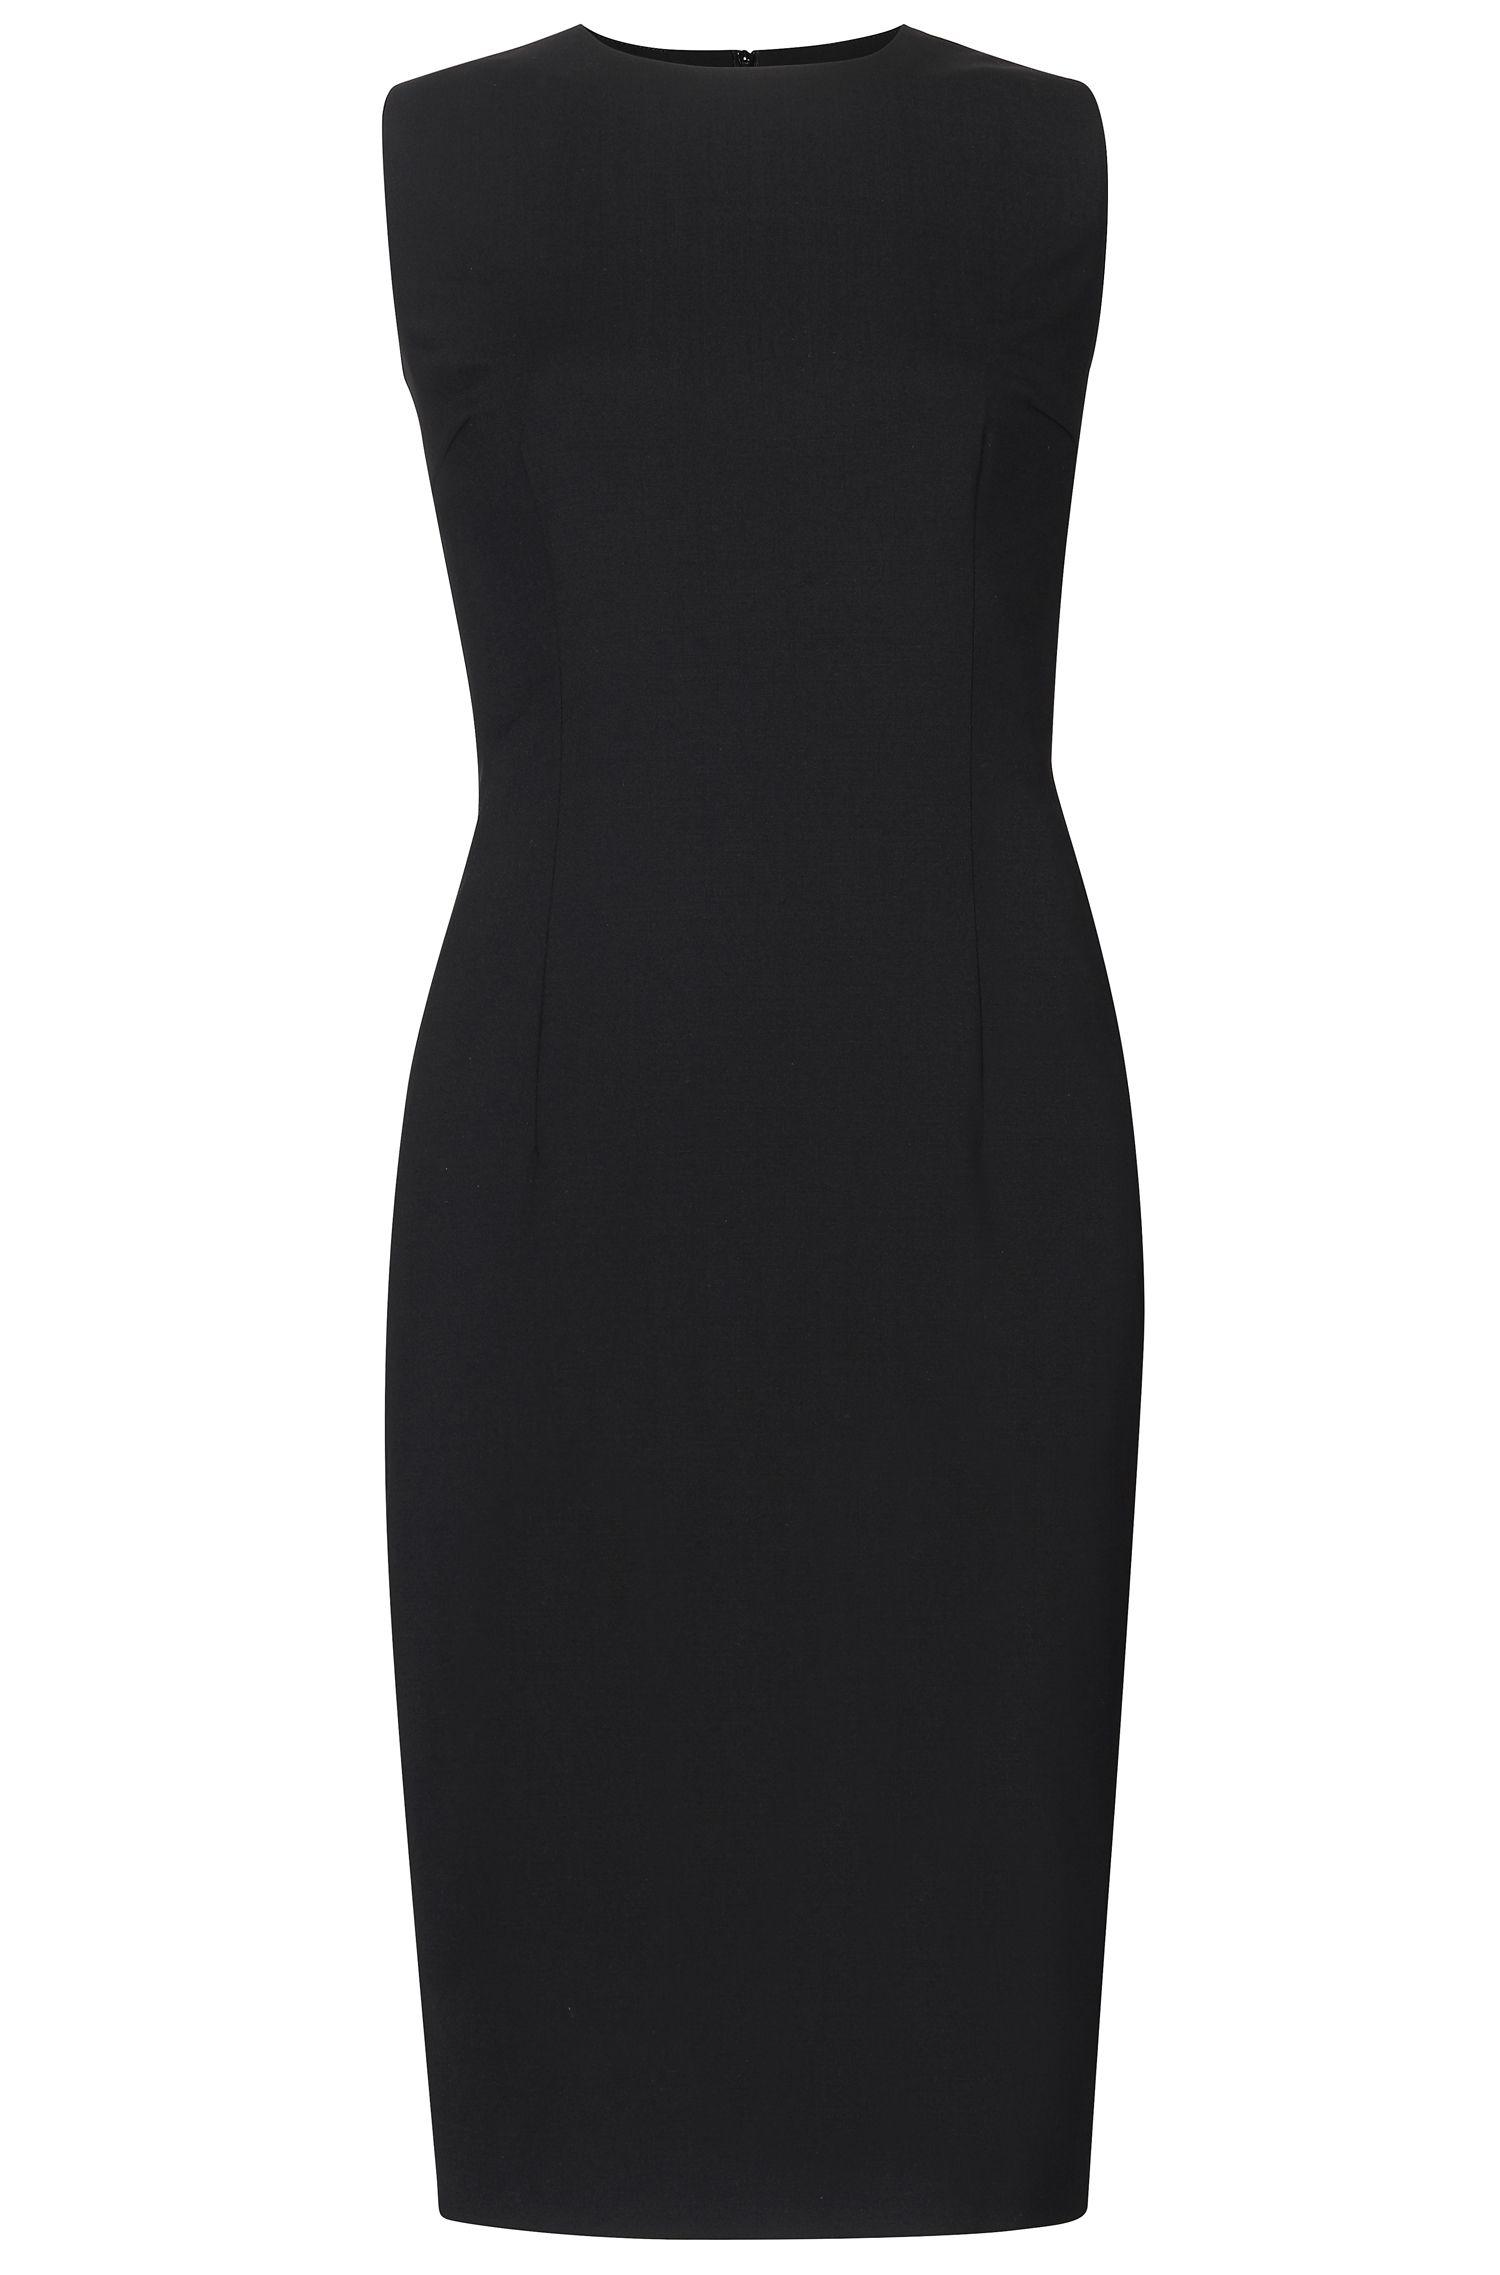 'Dirusa' | Stretch Virgin Wool Shift Dress